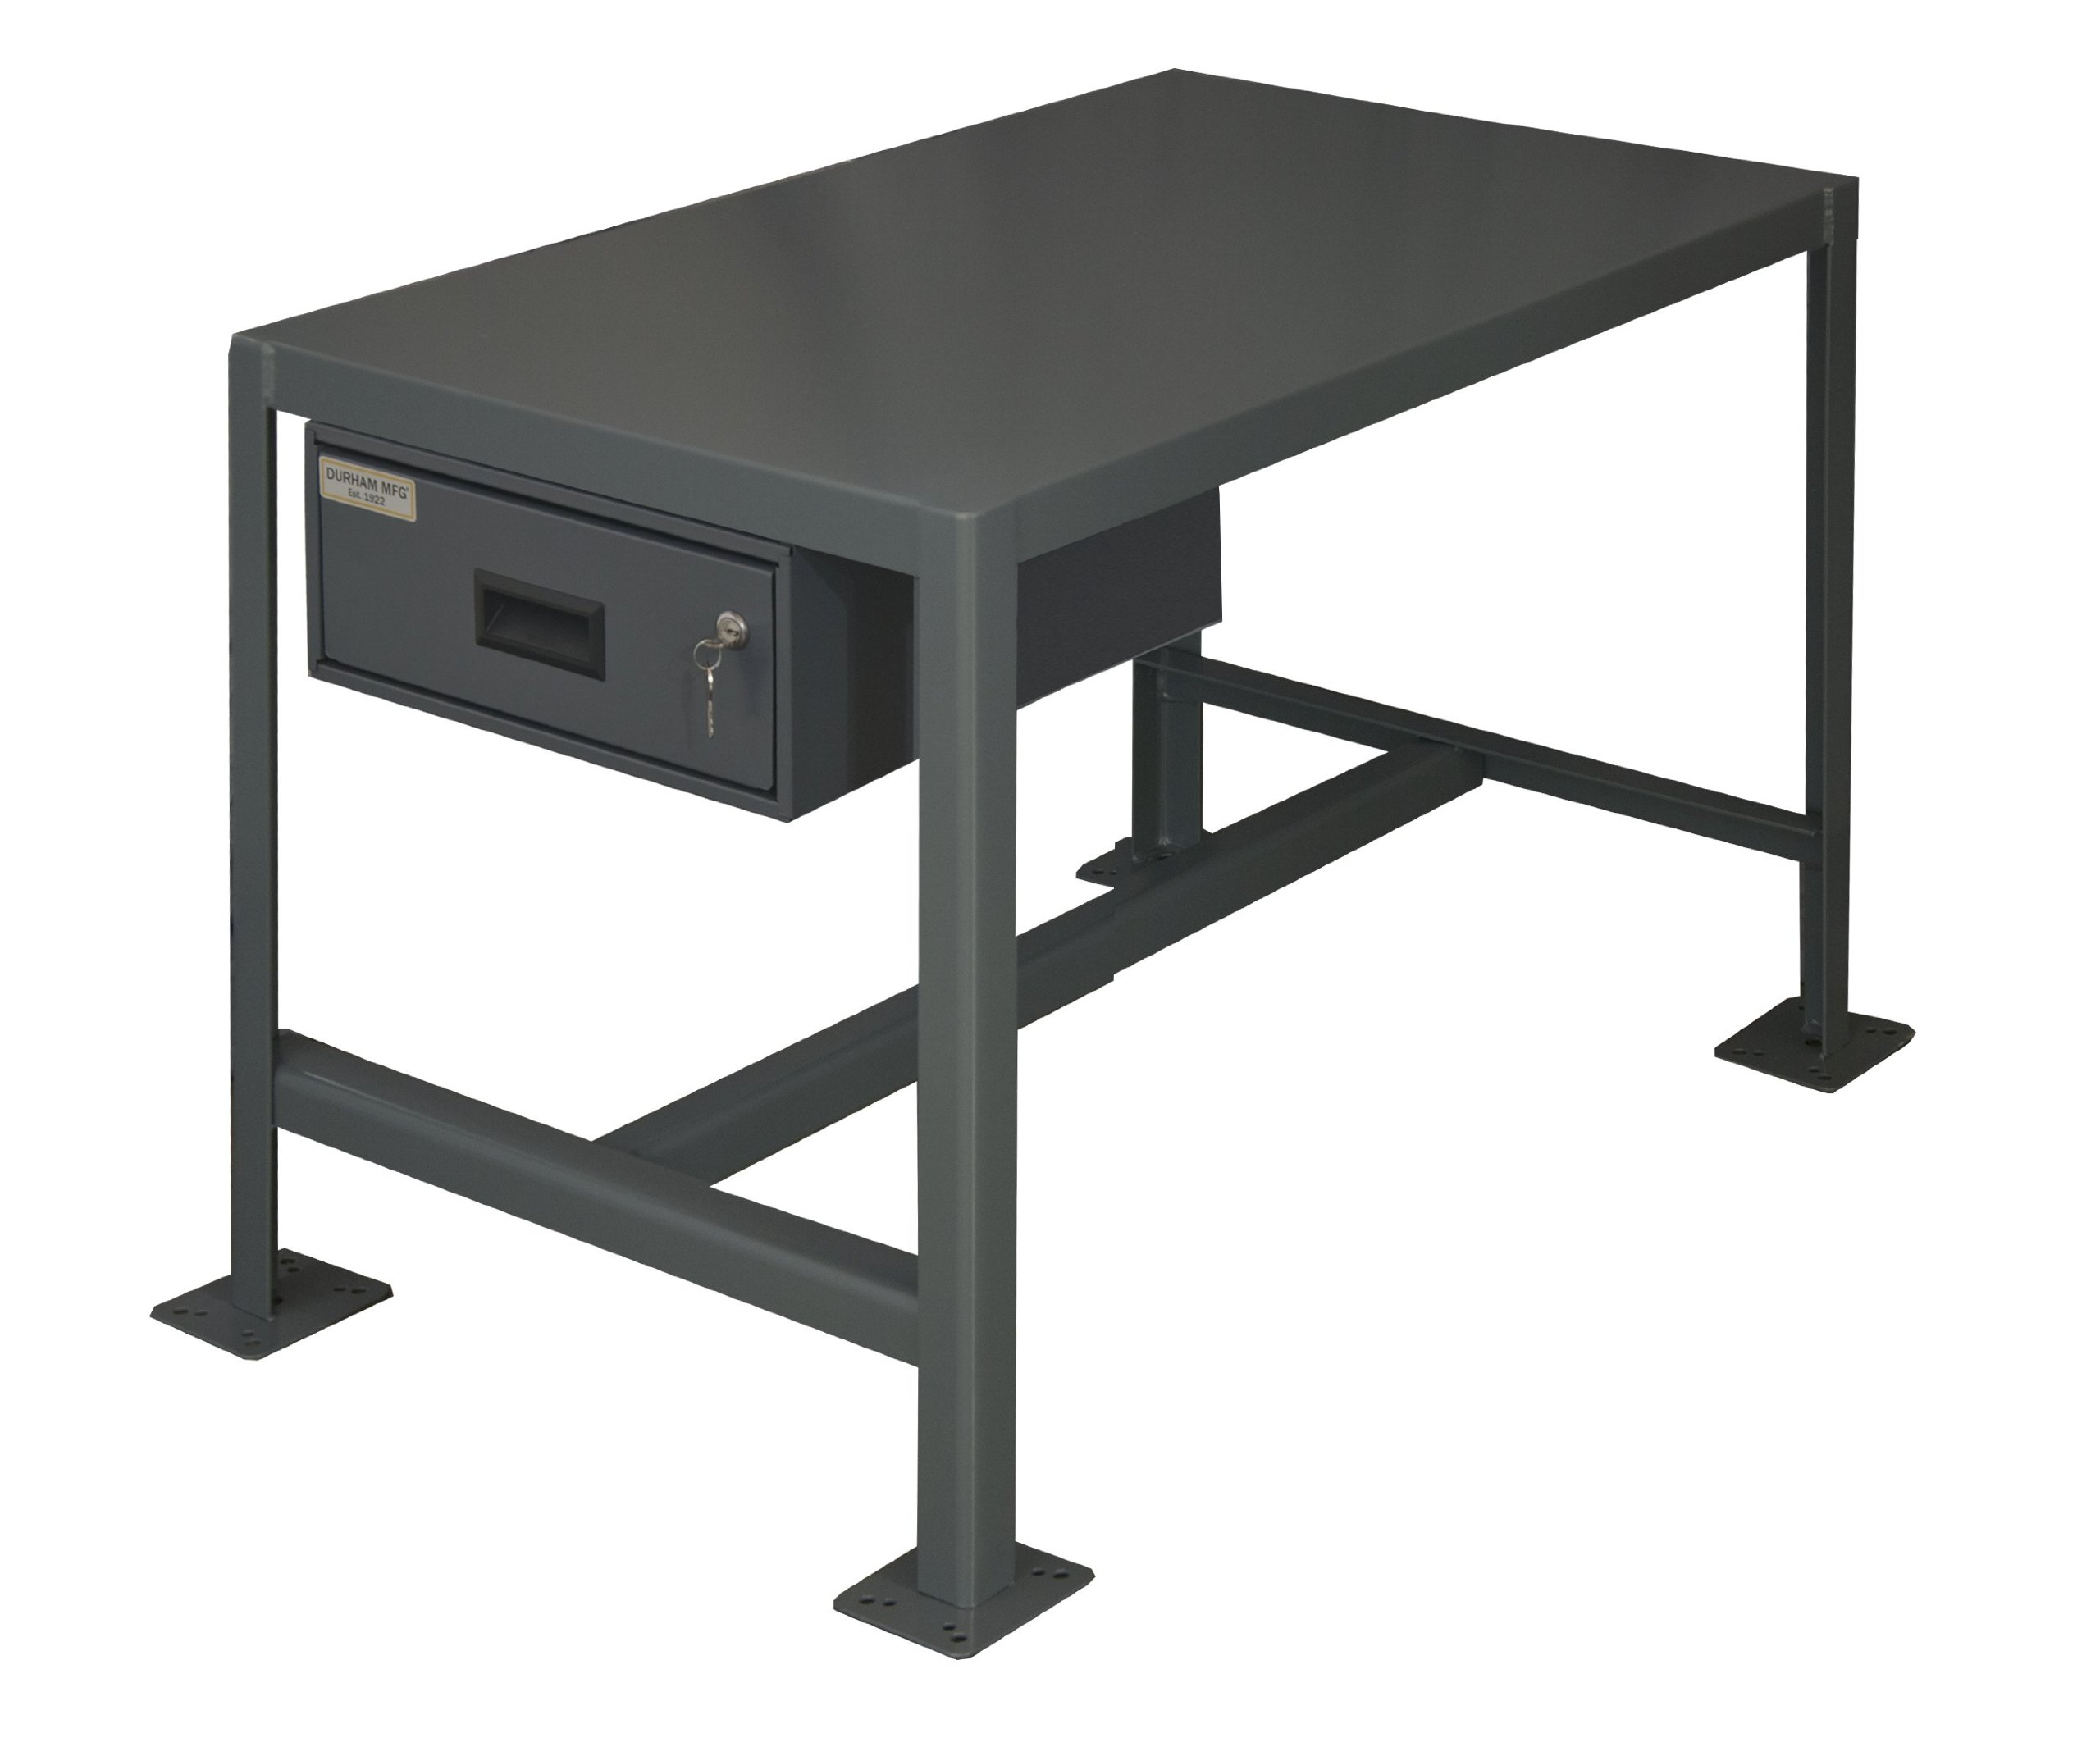 Durham Steel Medium Duty Machine Tables with Drawer, MTD182430-2K195,  1 Shelves,  2000 lbs Capacity,  24'' Length x 18'' Width x 30'' Height by Durham